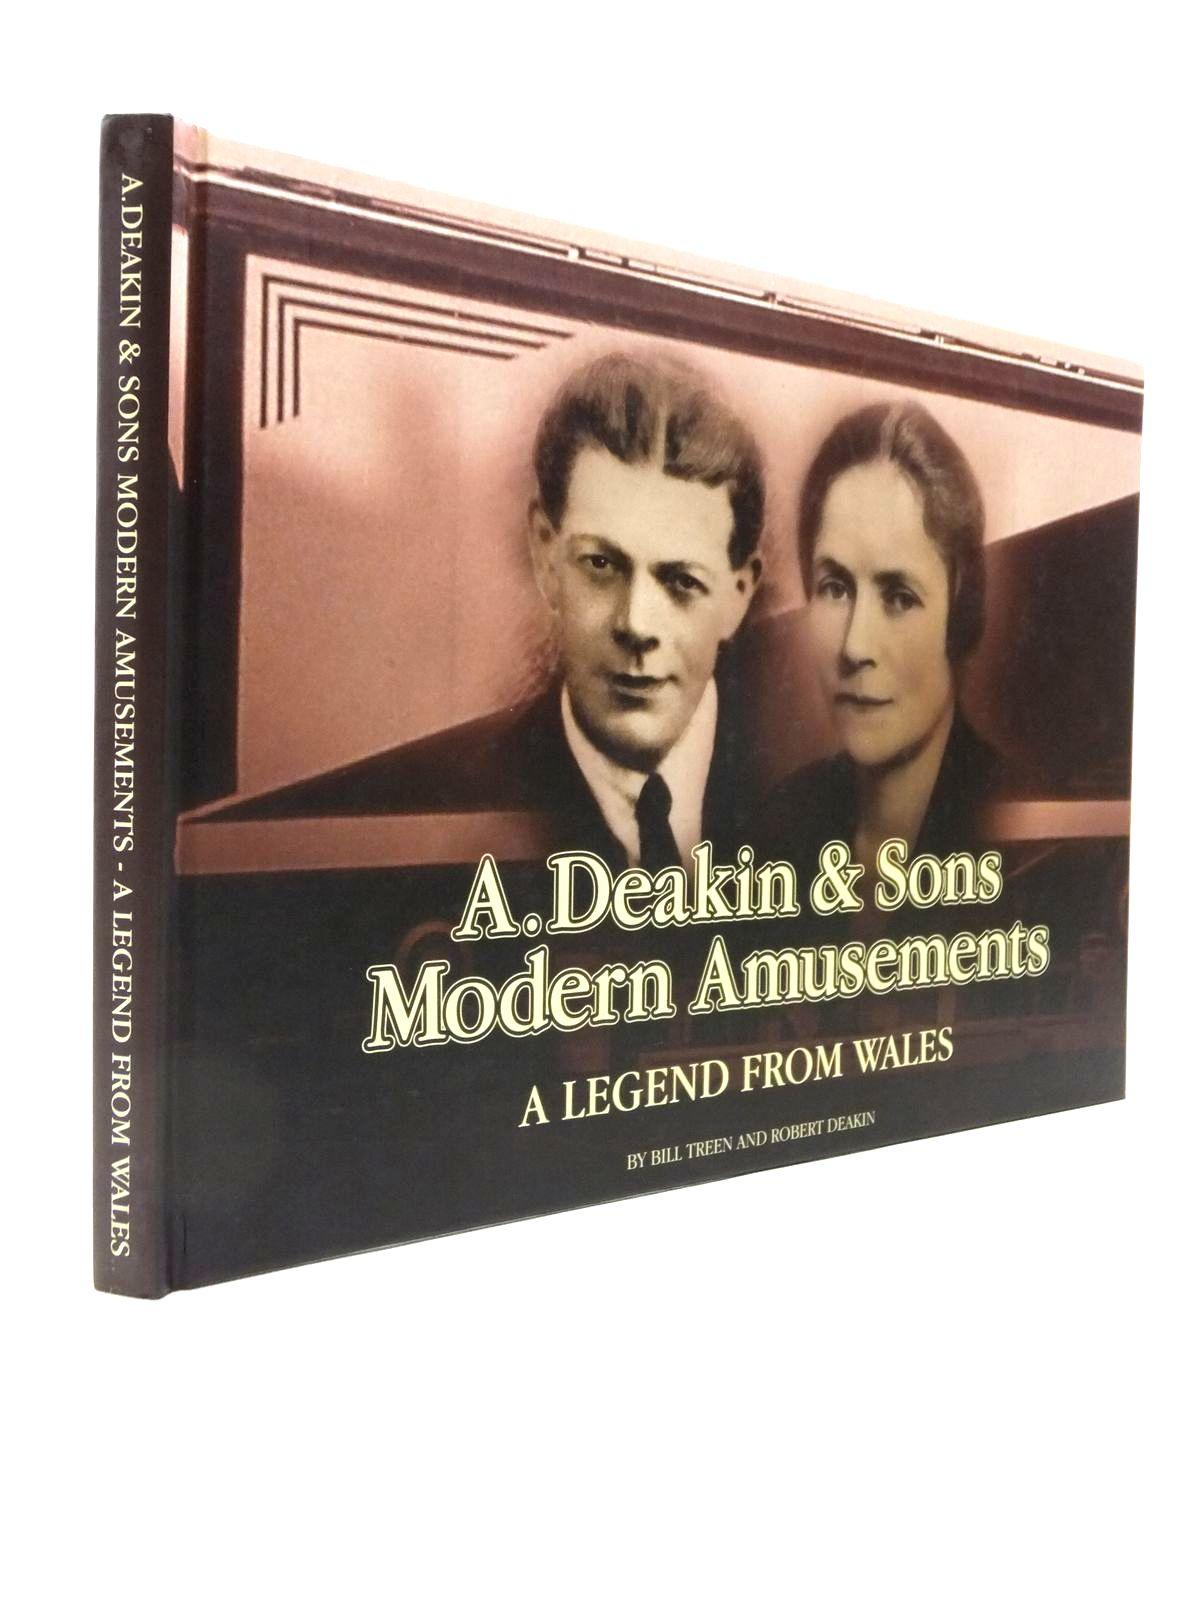 Photo of A. DEAKIN & SONS MODERN AMUSEMENTS A LEGEND FROM WALES written by Treen, Bill<br />Deakin, Robert published by Forrest Print (STOCK CODE: 1208296)  for sale by Stella & Rose's Books